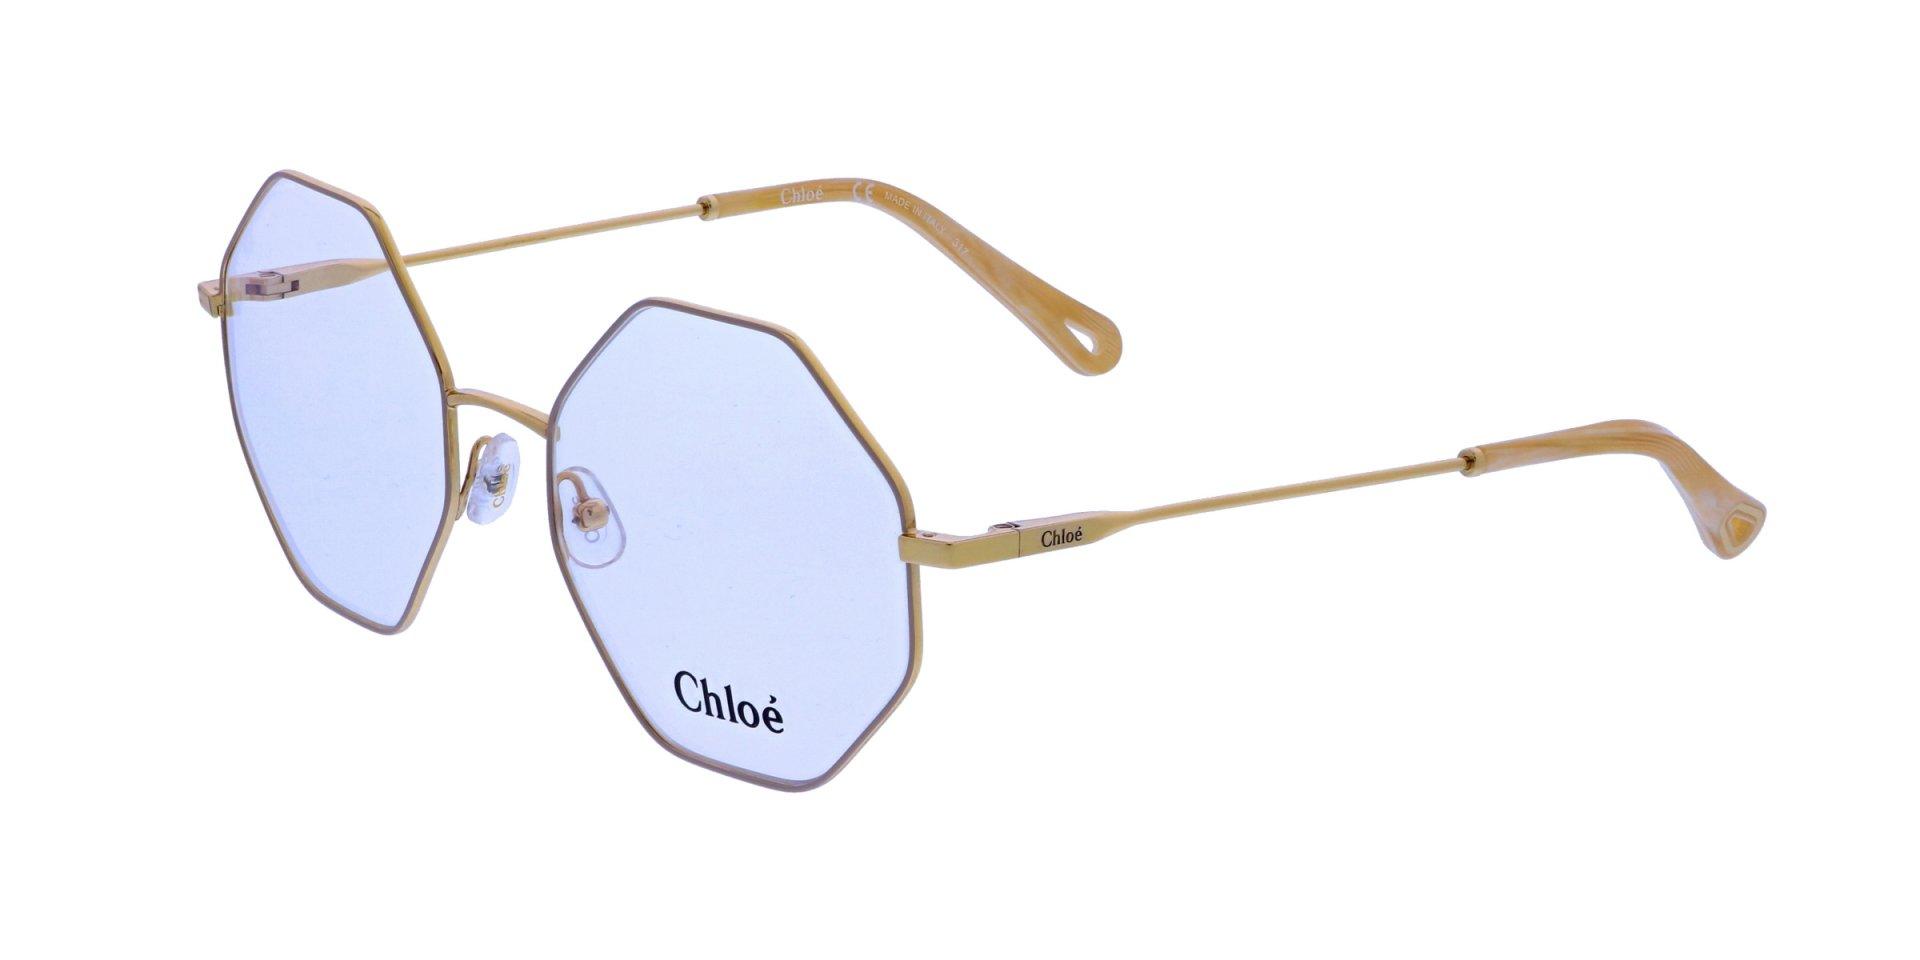 CHLOE CE2134 743